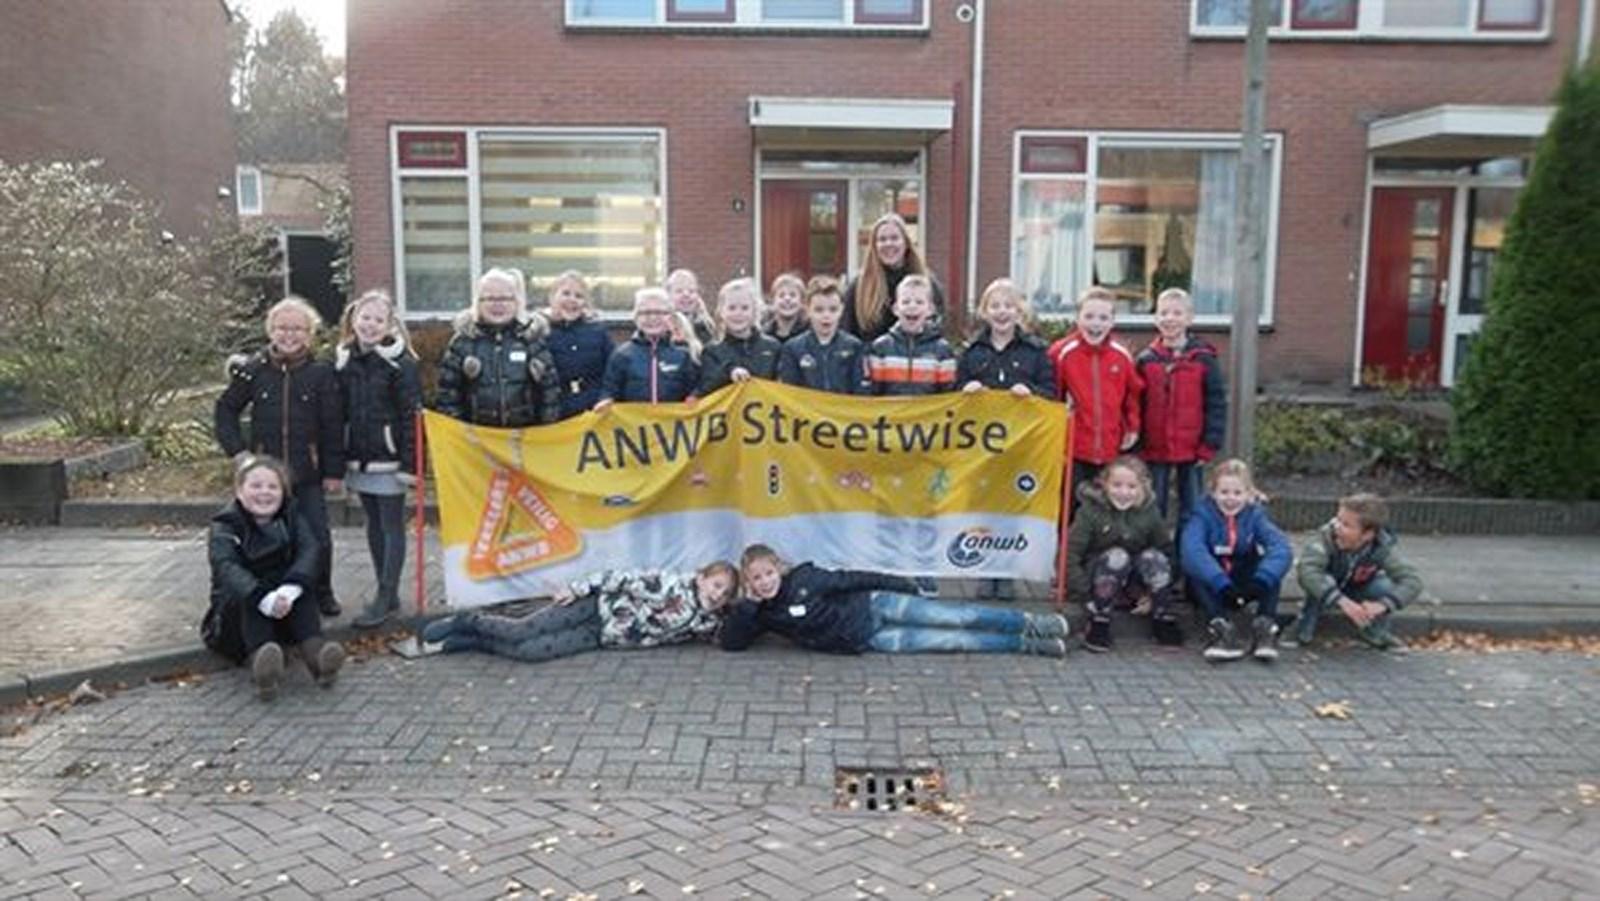 streetwise-groep-5-1600x1200